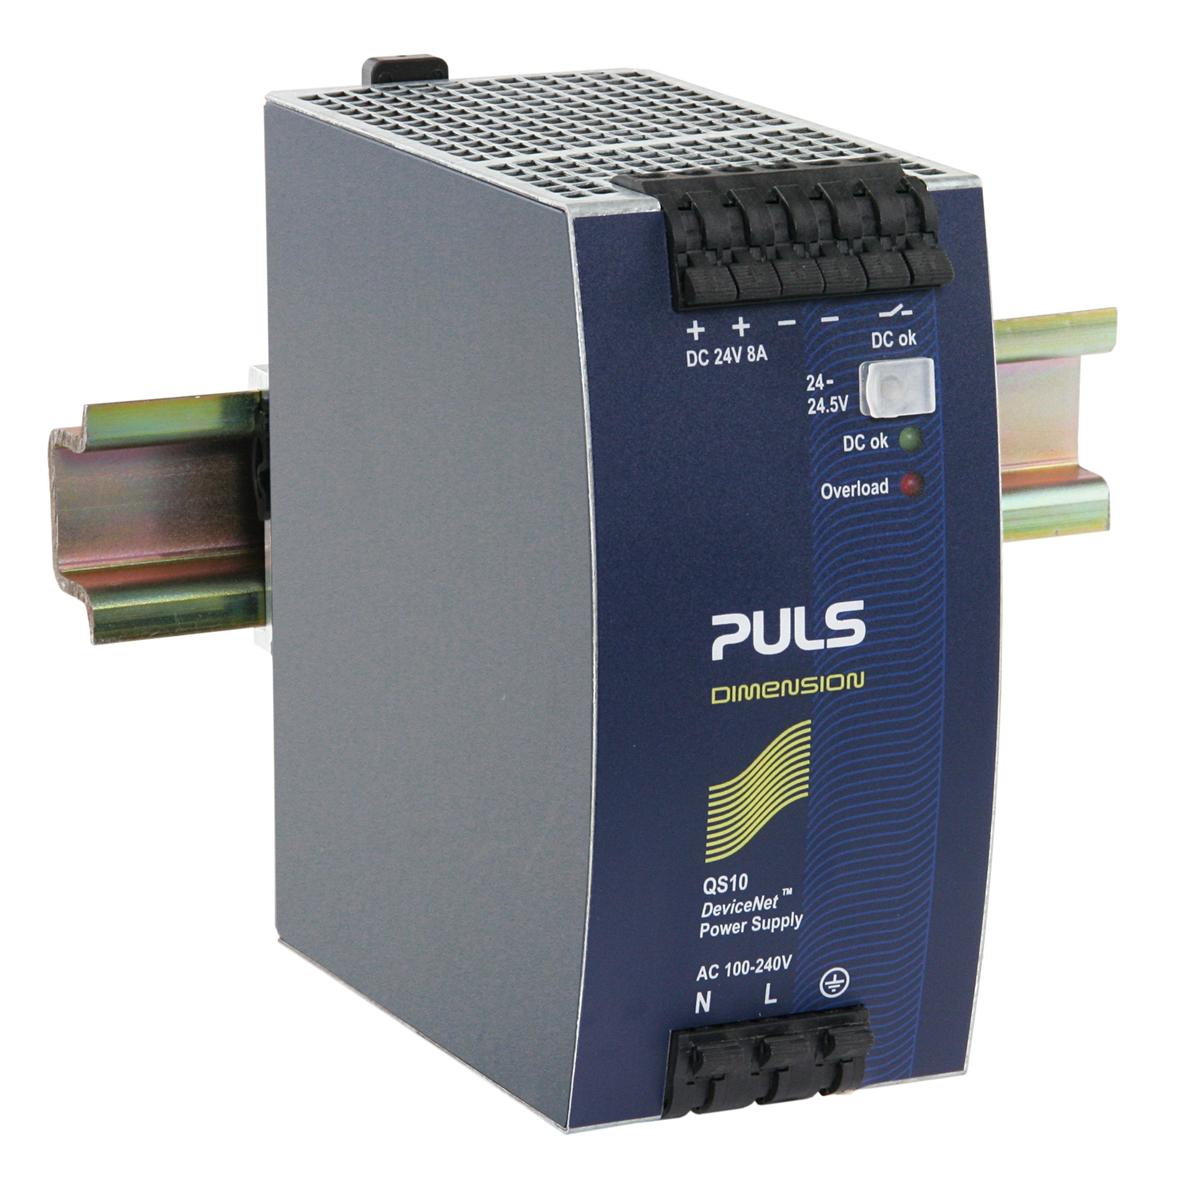 allen bradley guardmaster safety relay wiring diagram hyundai accent stereo devicenet profibus diagrams